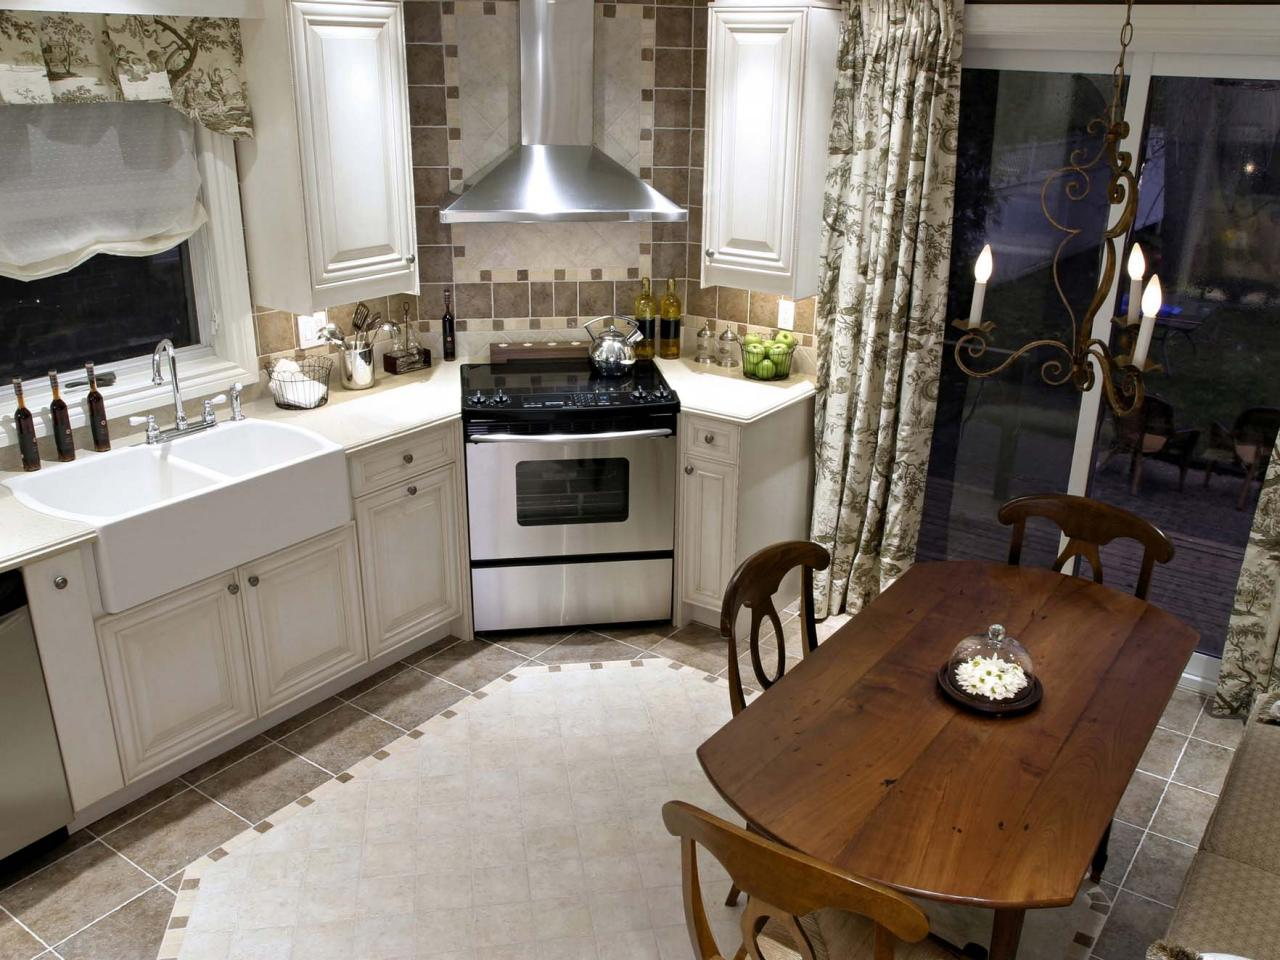 candice olson kitchen layouts photo - 3